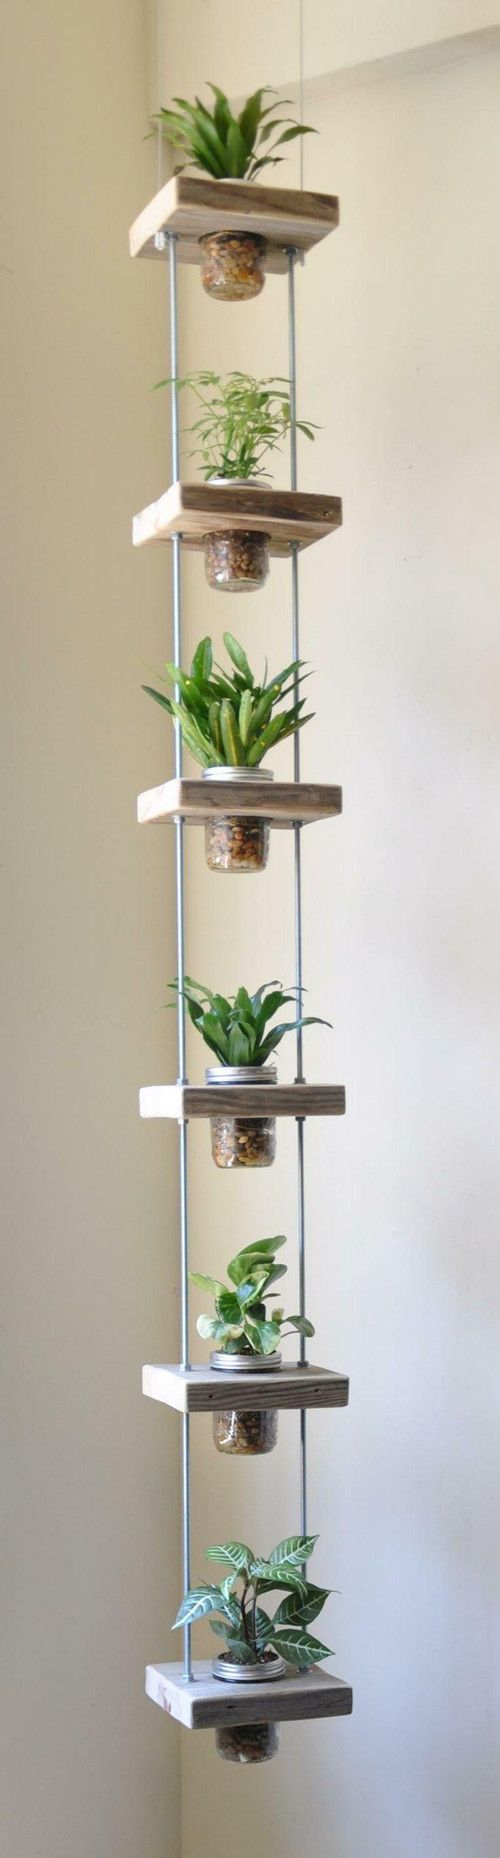 Creative indoor vertical wall gardens planters gardens and room decor